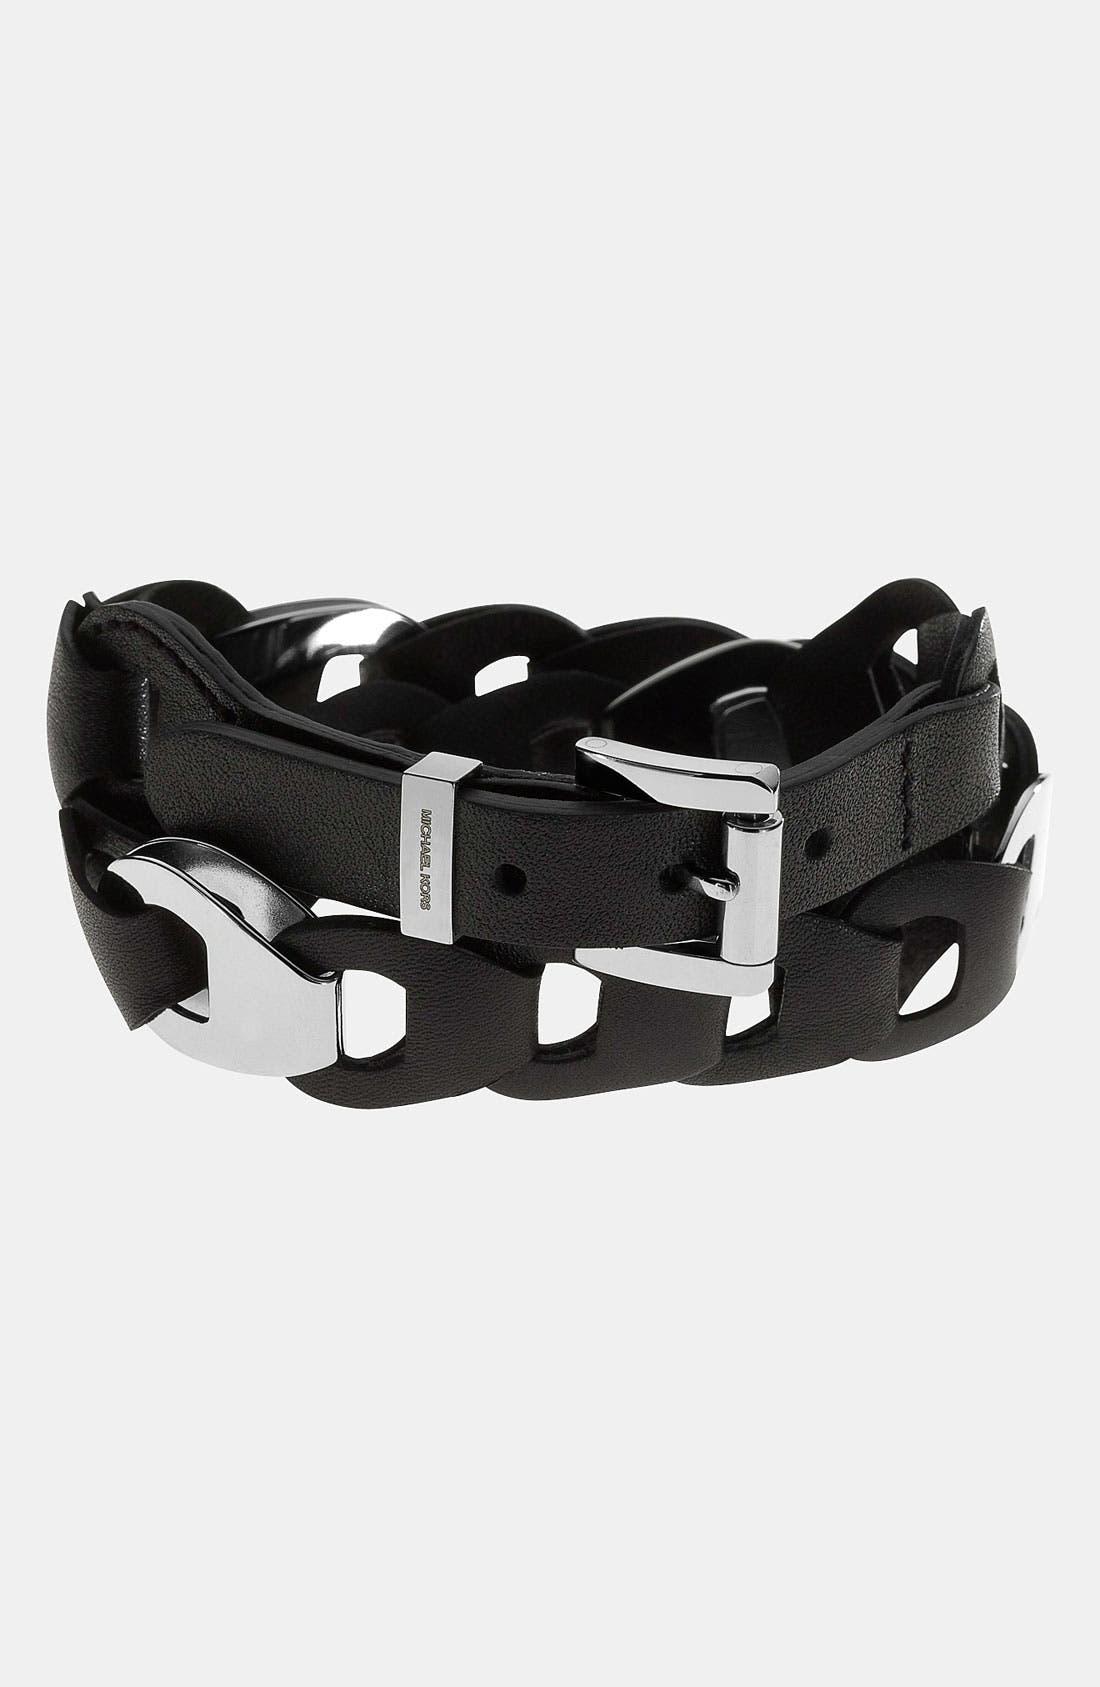 Alternate Image 1 Selected - Michael Kors 'Equestrian Luxury' Leather Wrap Bracelet